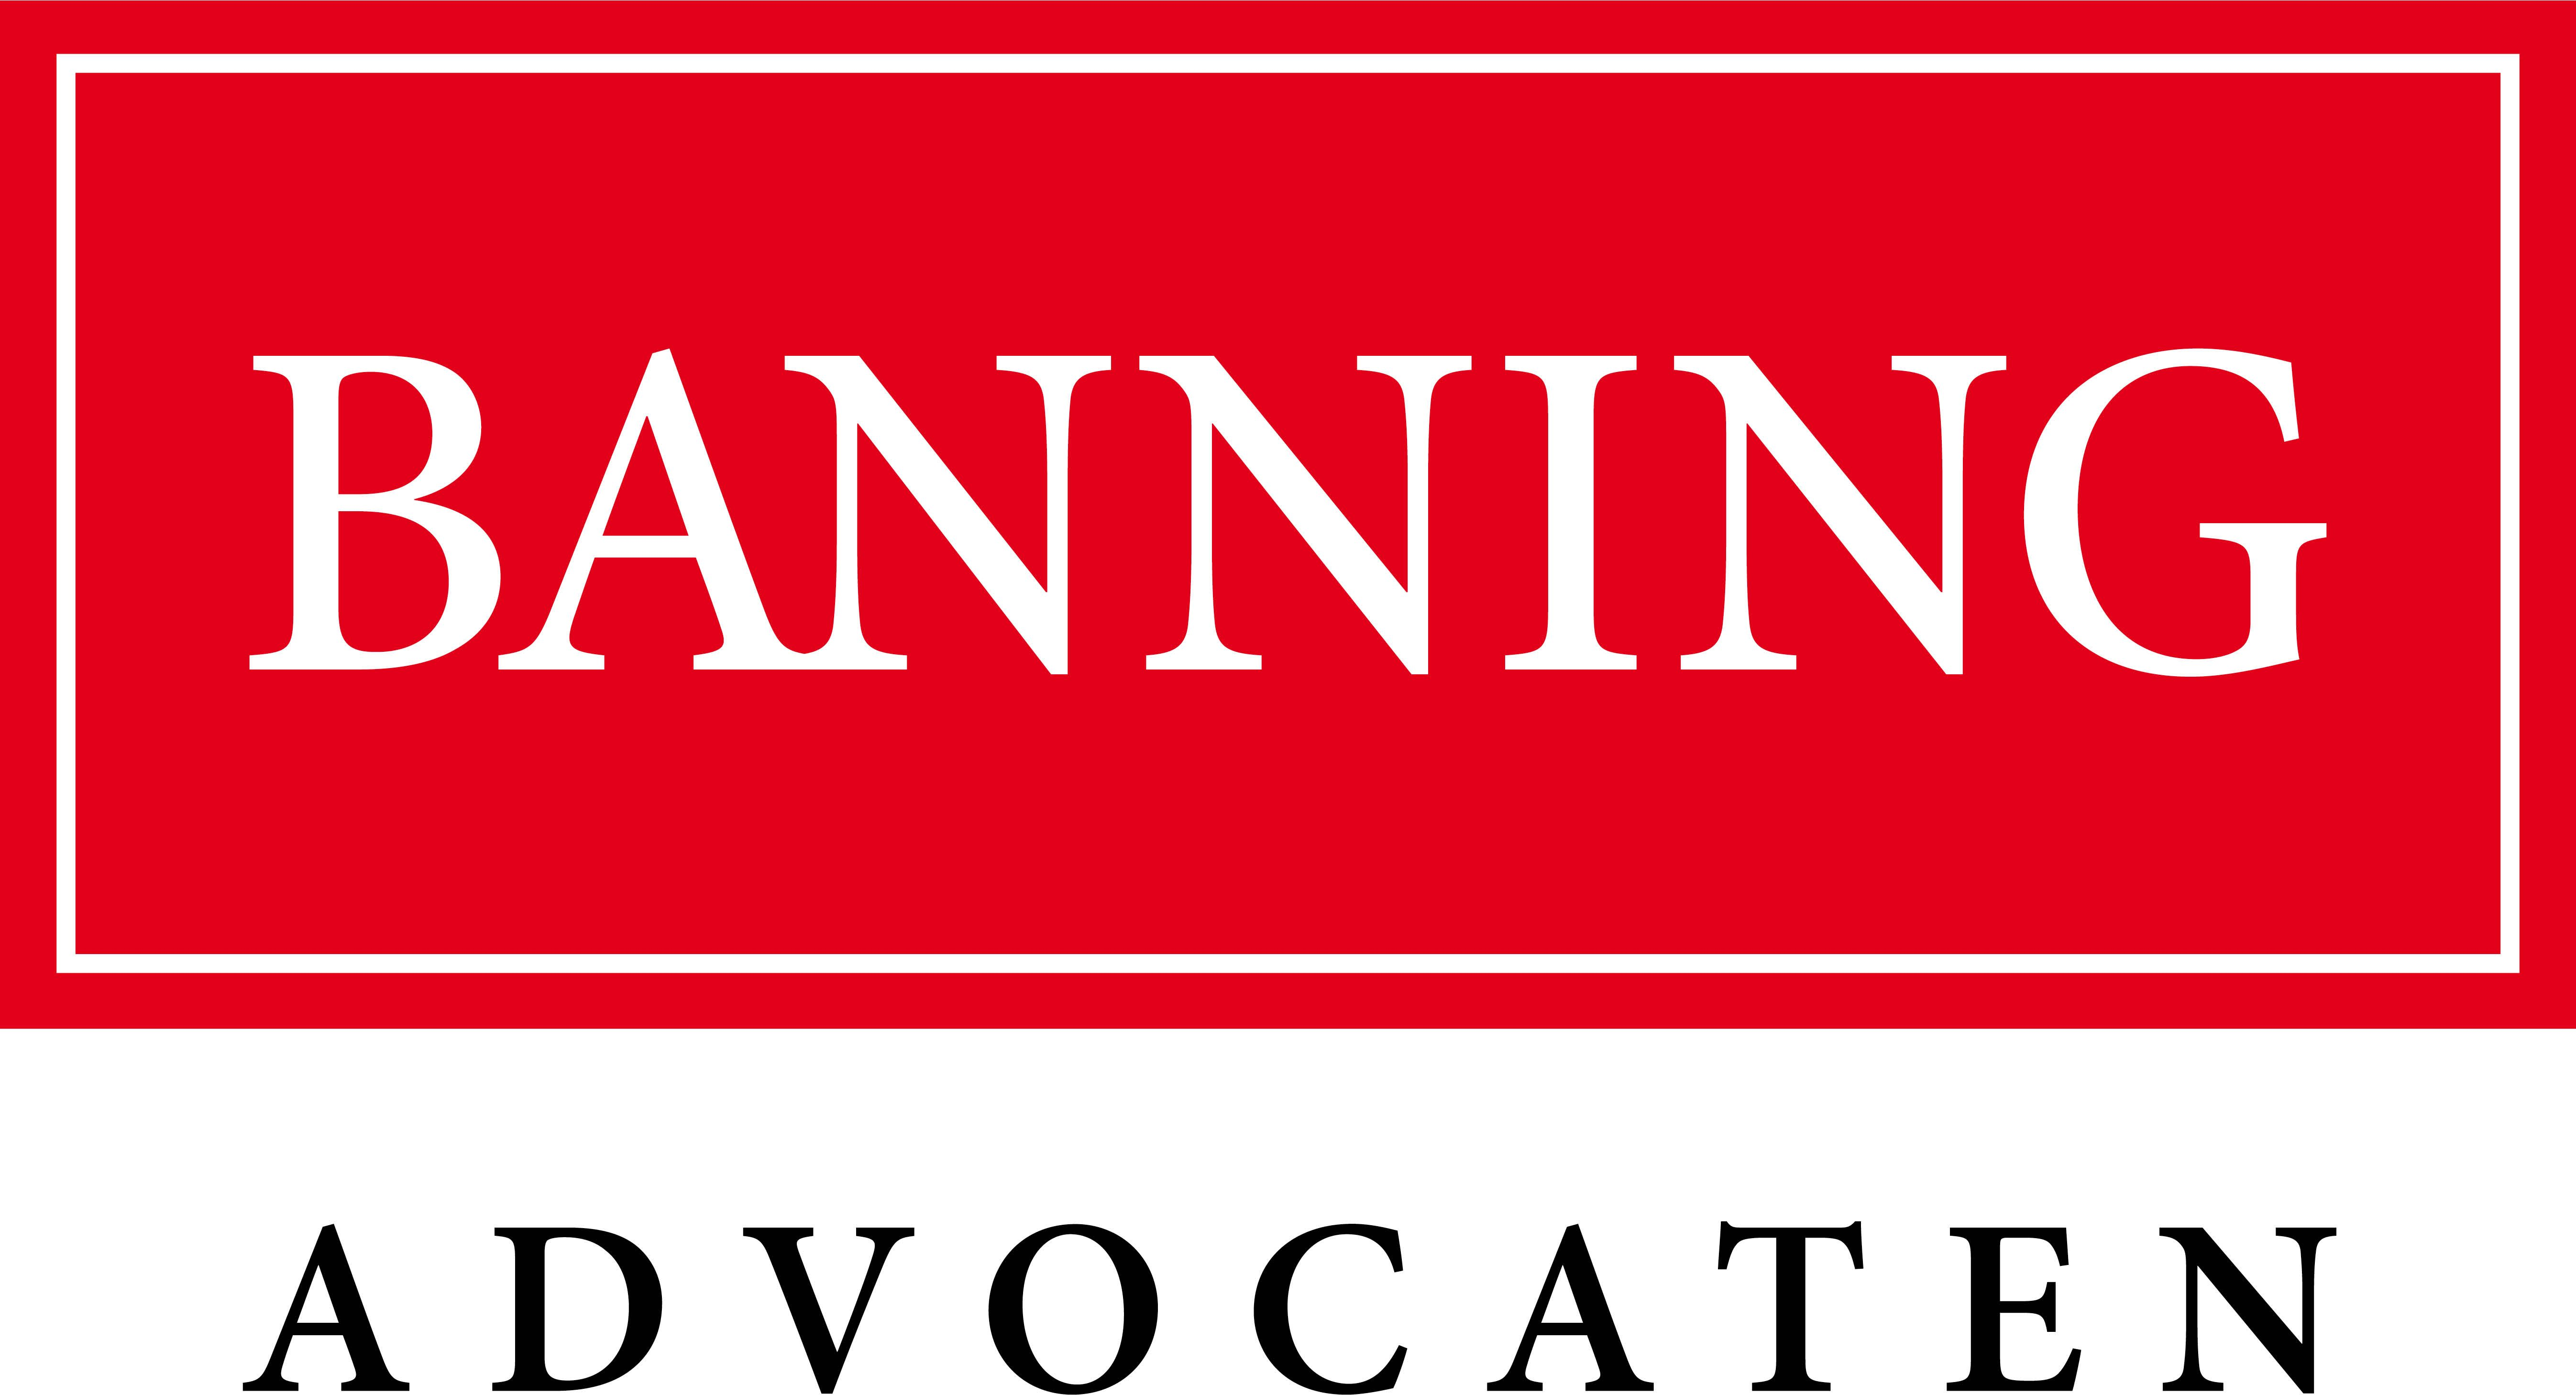 BANNING Advocaten